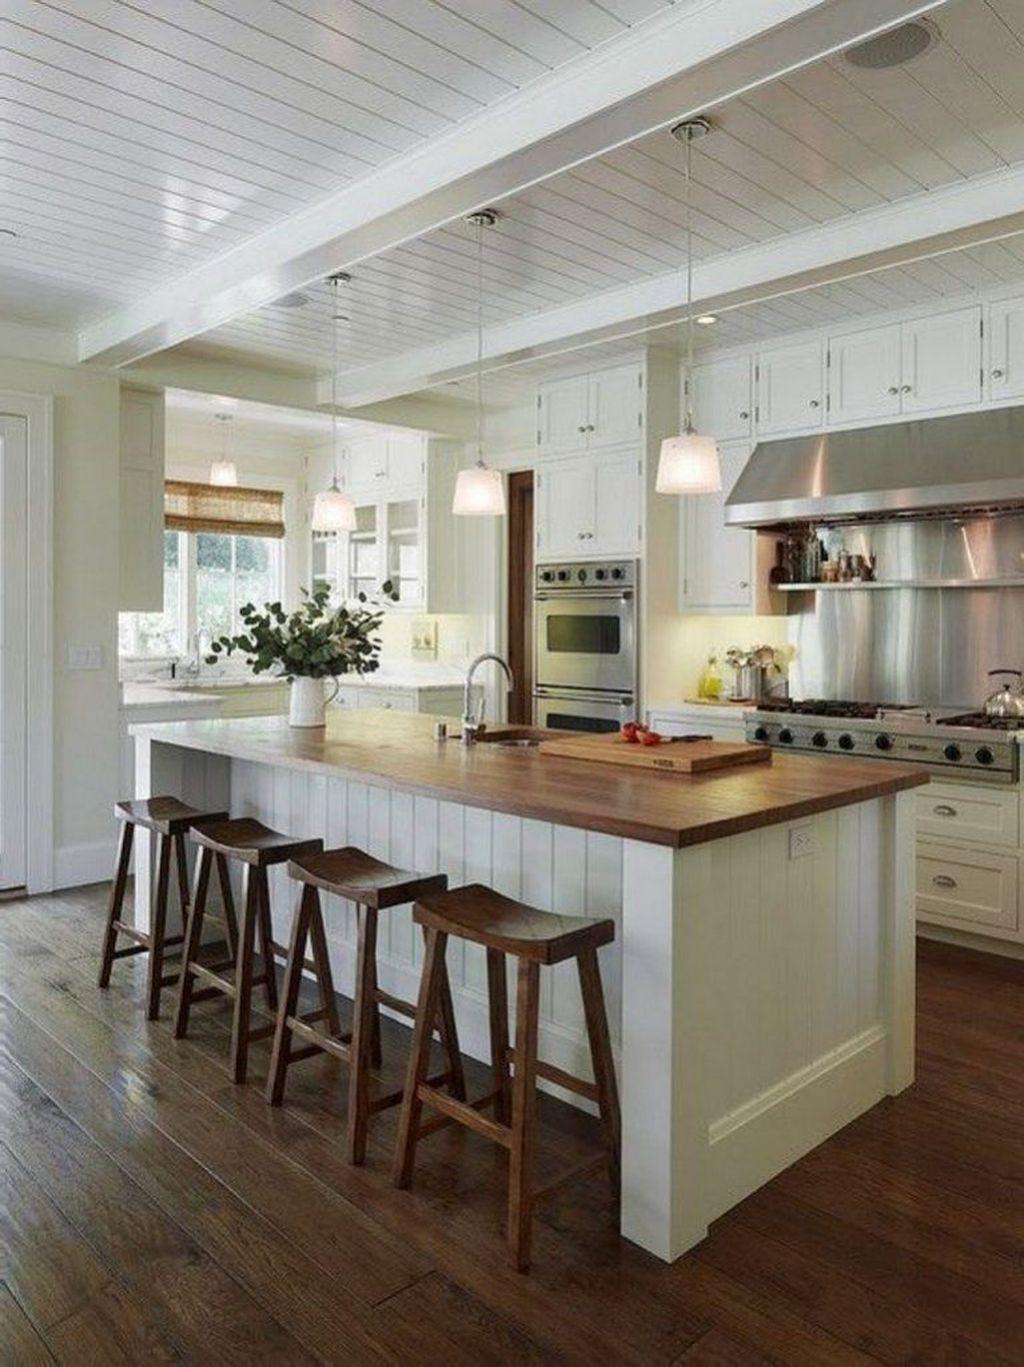 Brilliant Small Kitchen Remodel Design Ideas On A Budget 39